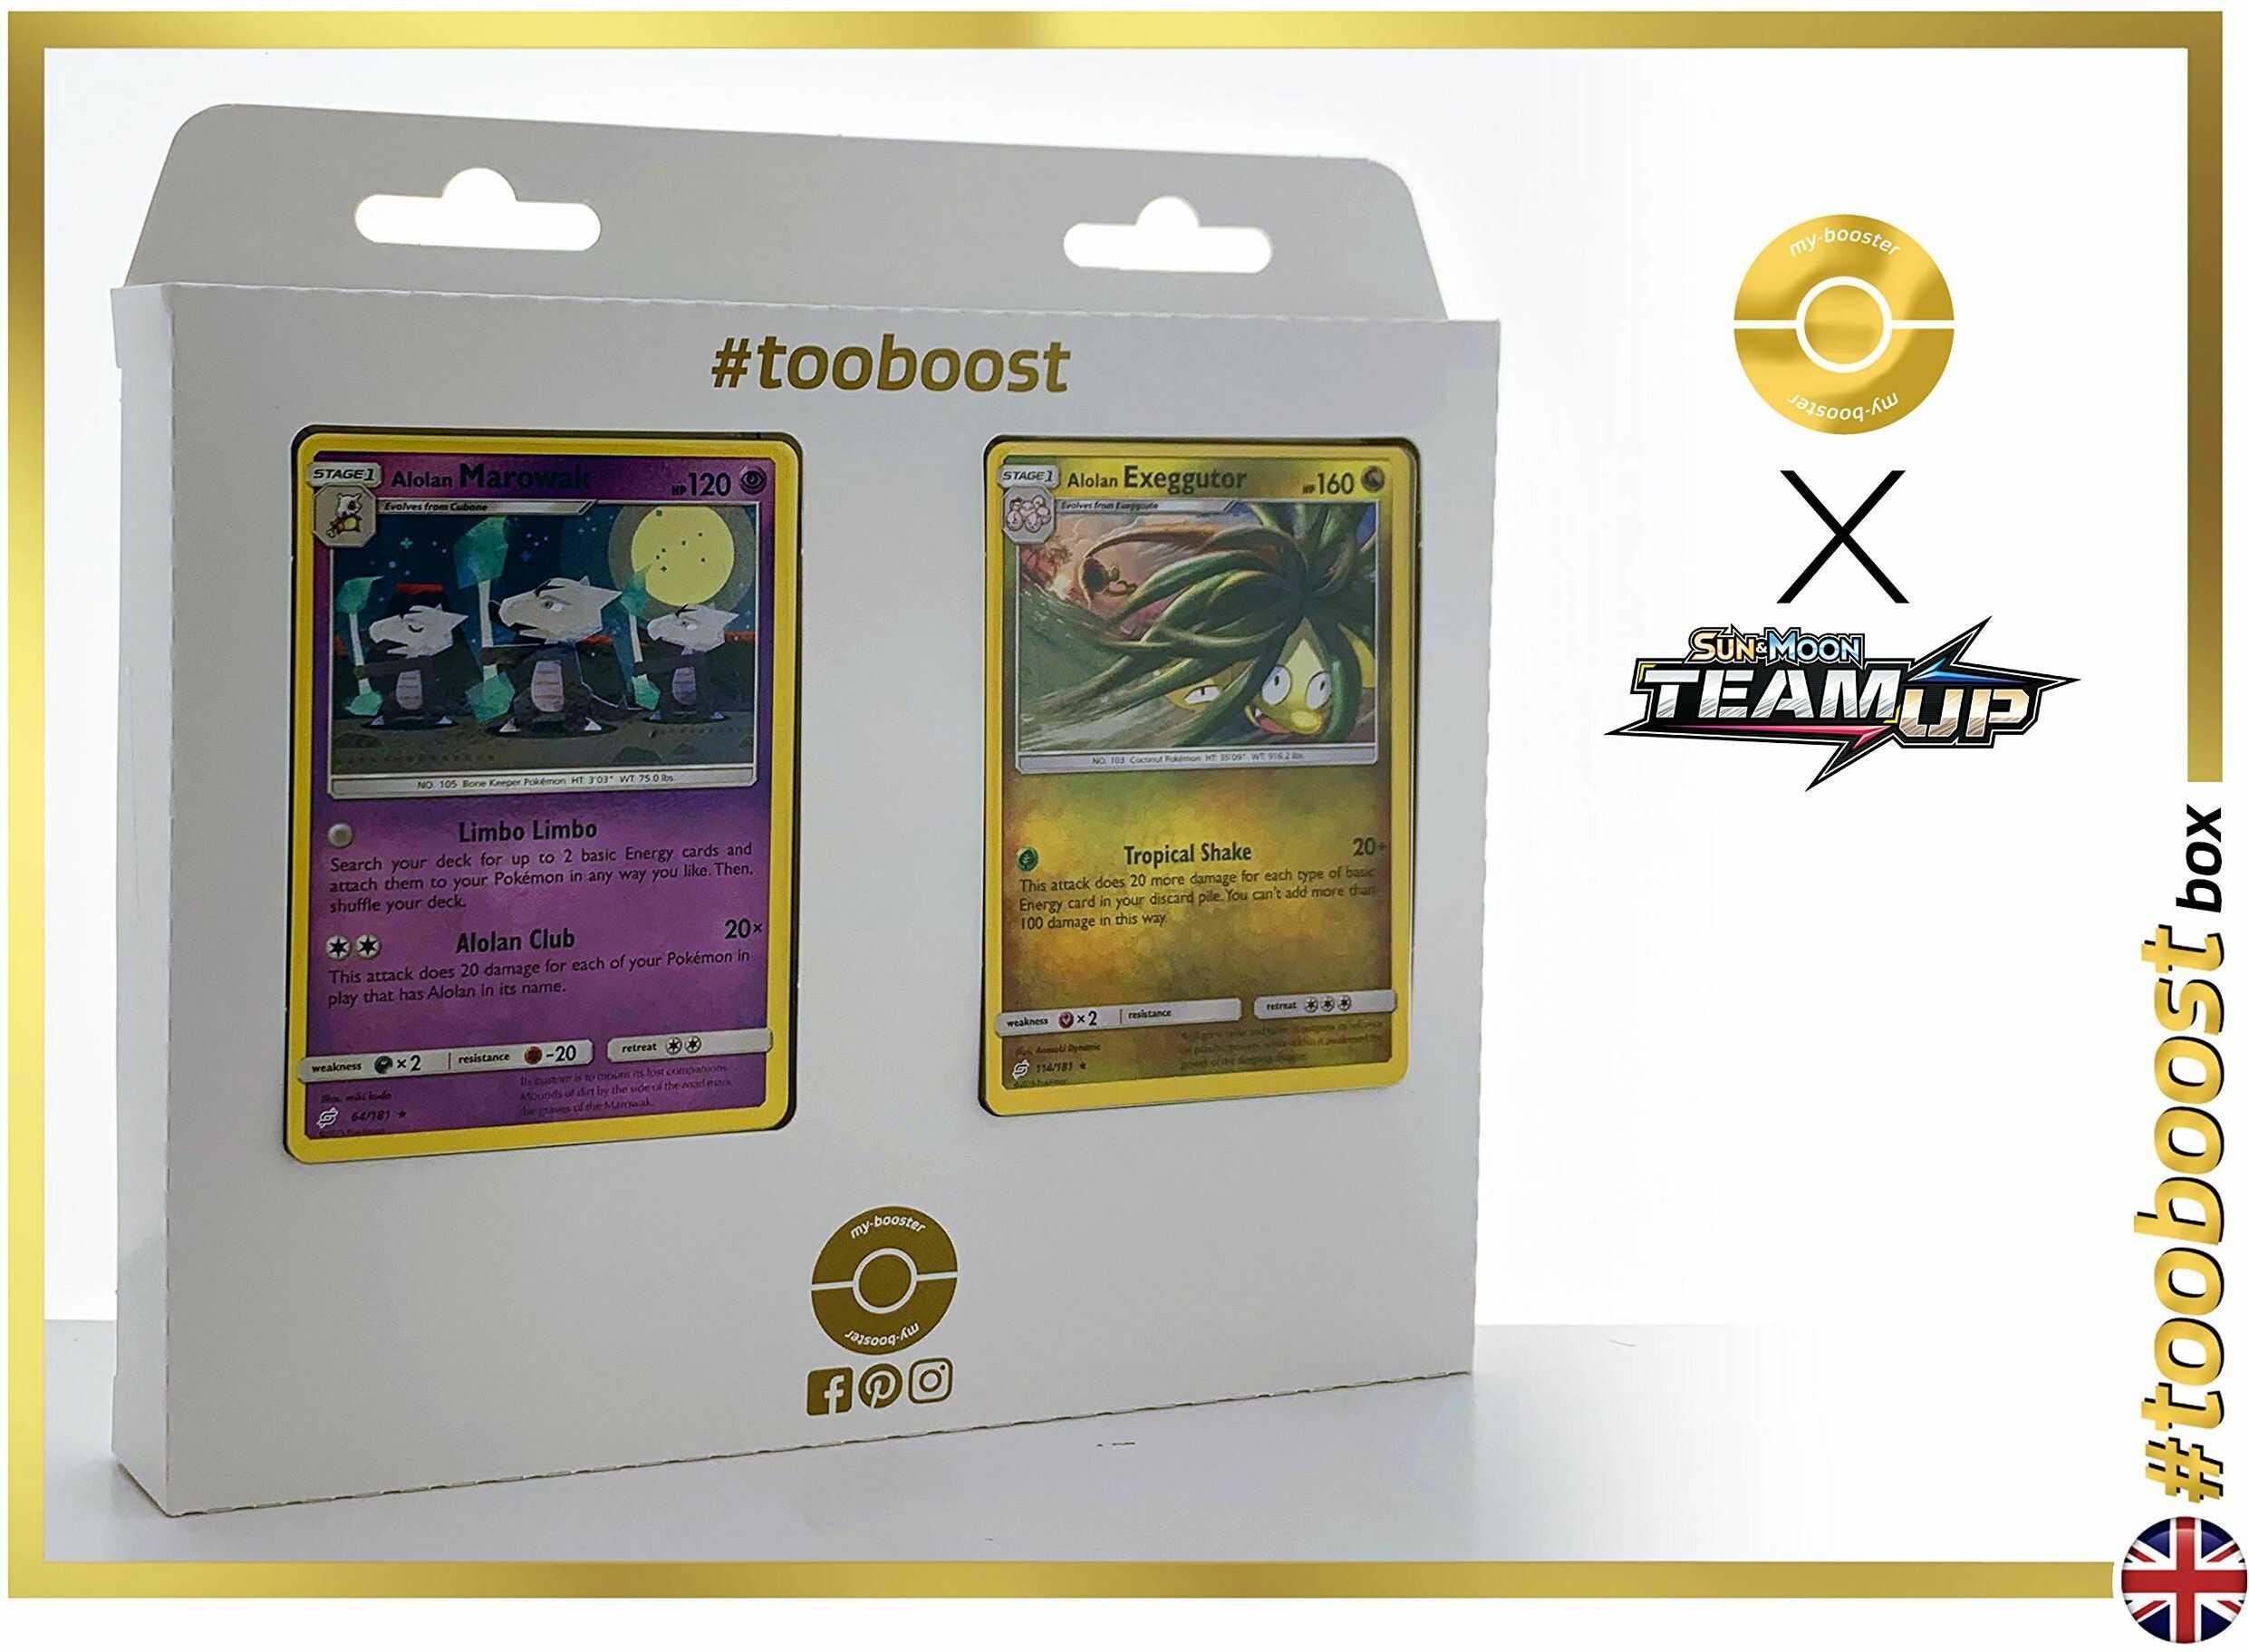 Alolan Marowak (Alola-Knogga) 64/181 & Alolan Exeggutor (Alola-Kokowei) 114/181  #tooboost X Sun & Moon 9 Team Up  pudełko z 10 angielskimi kartami Pokémon + 1 Goodie Pokémon